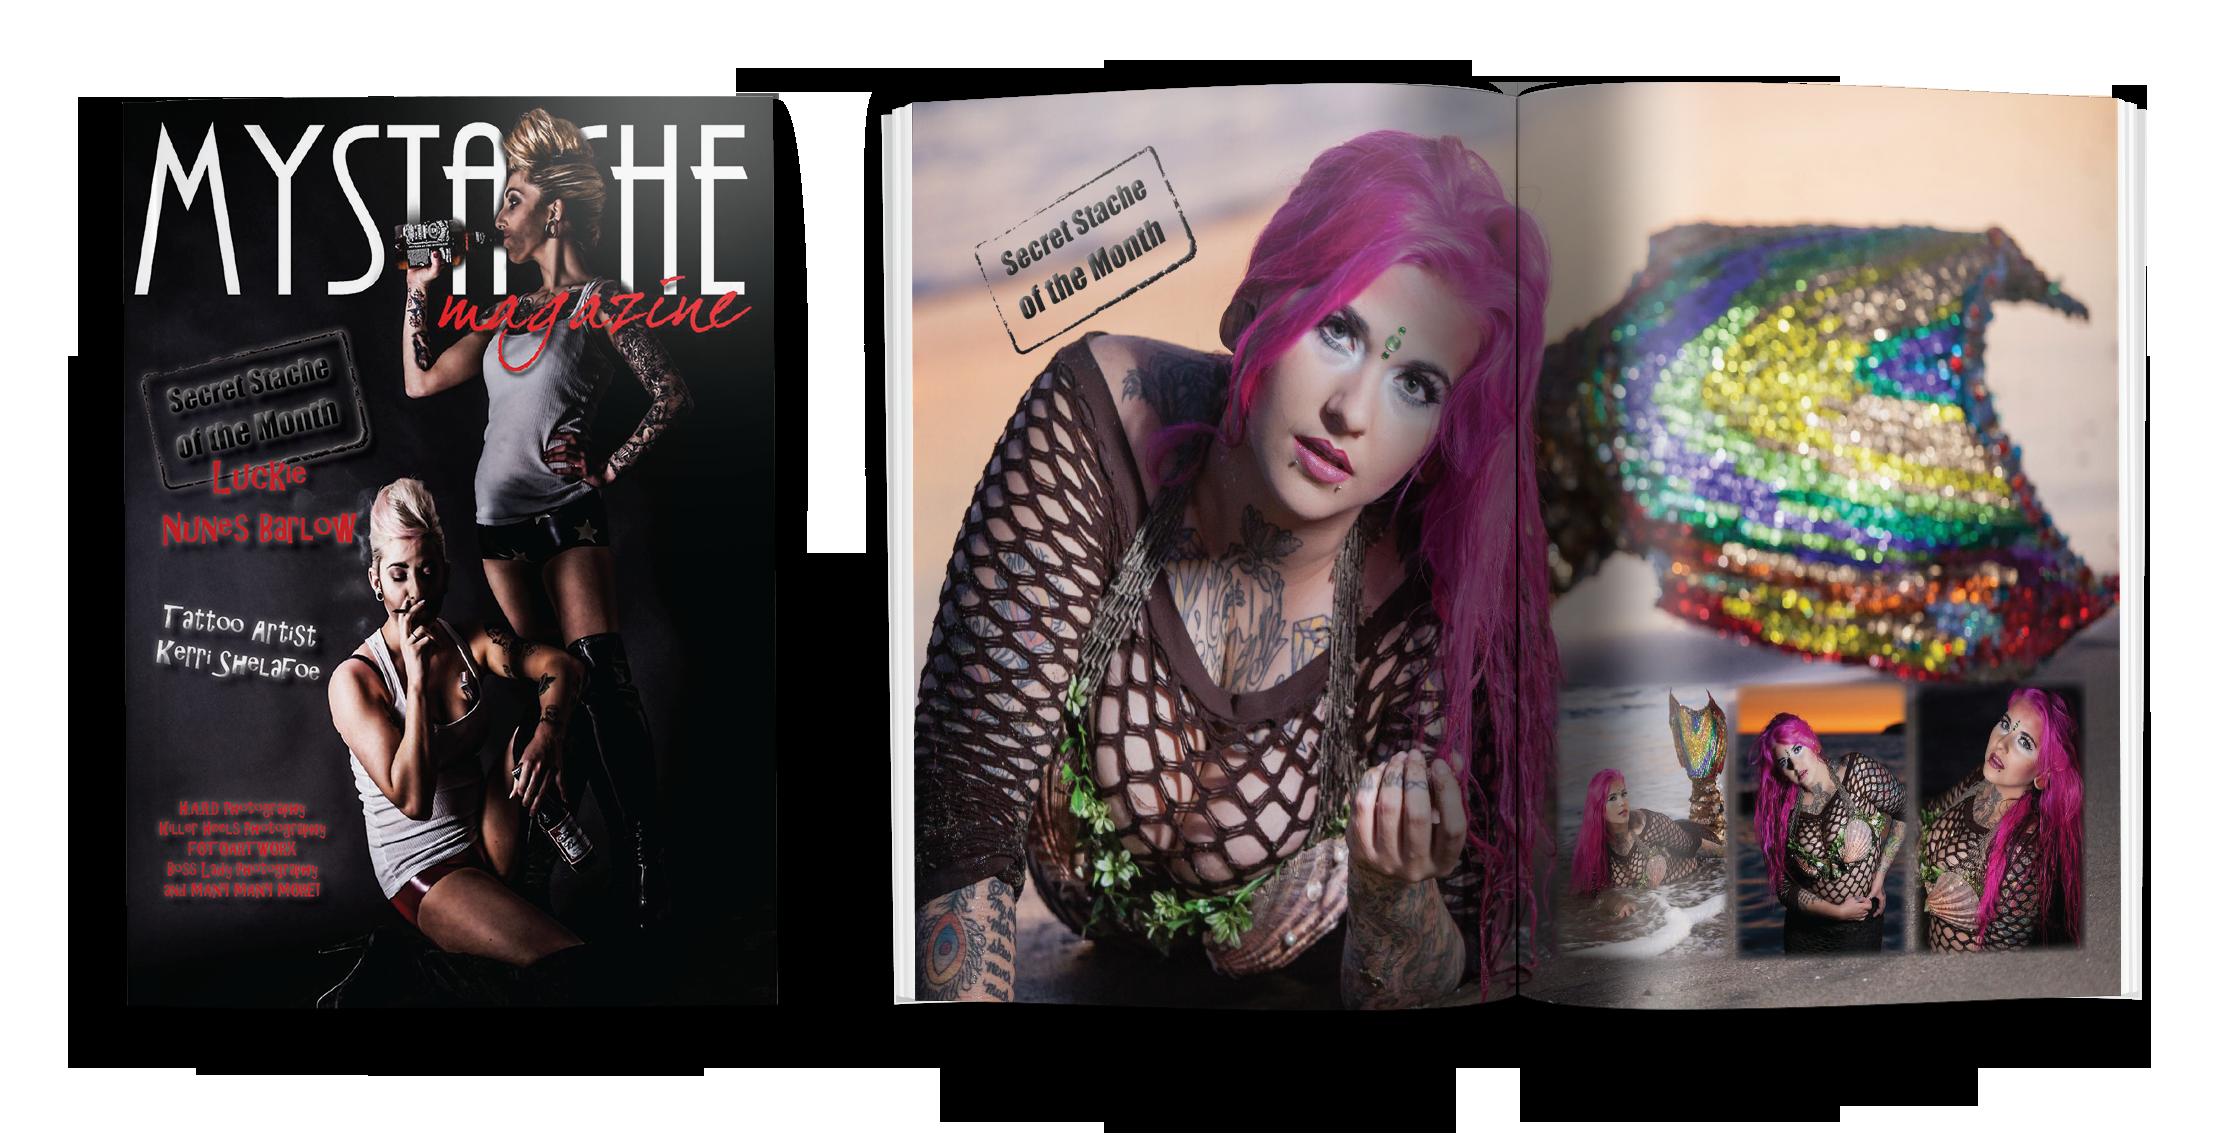 mystache_magazine_my_stache_alter_ego_edition_render2.png